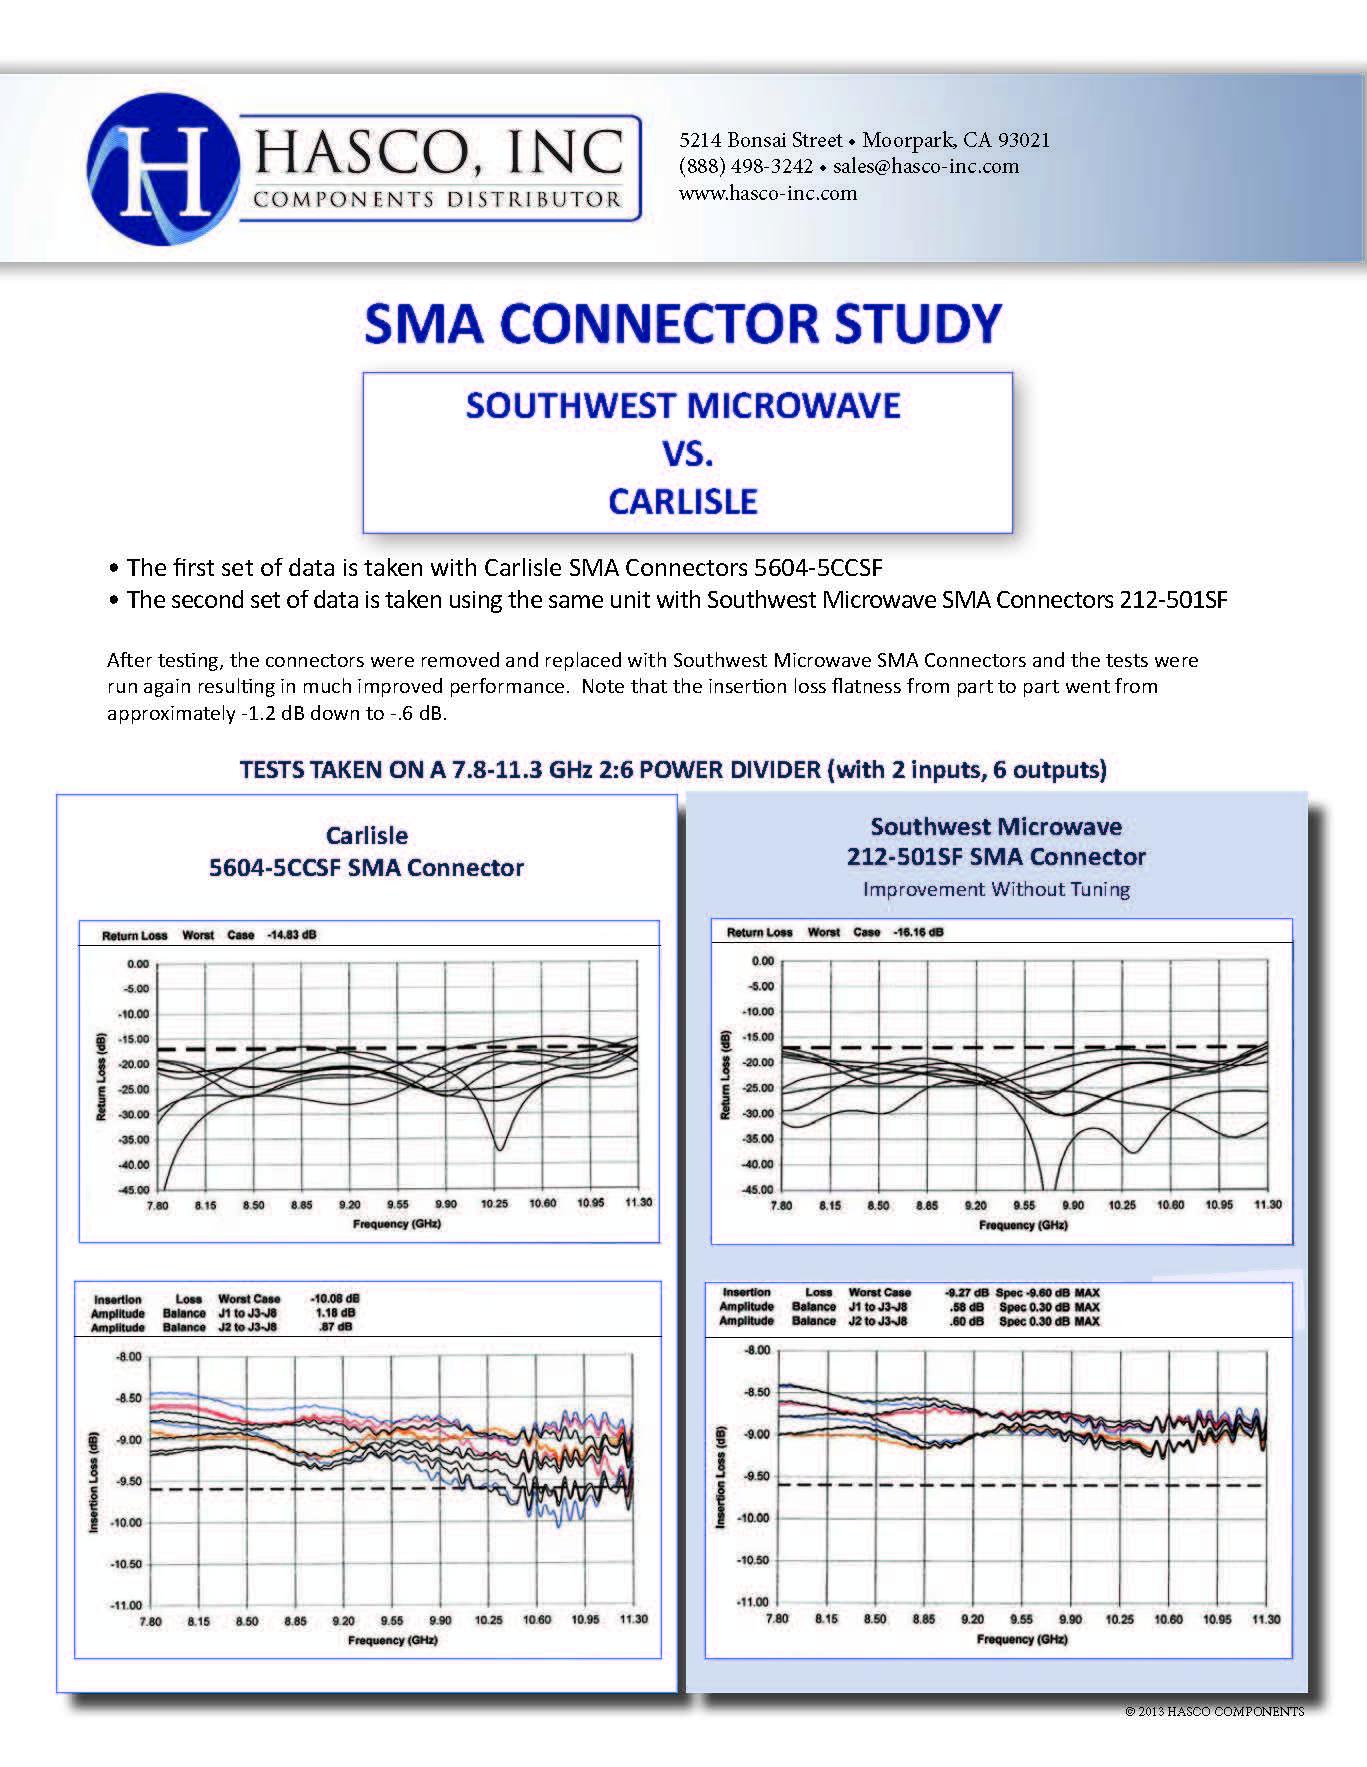 sma-connector-study.jpg